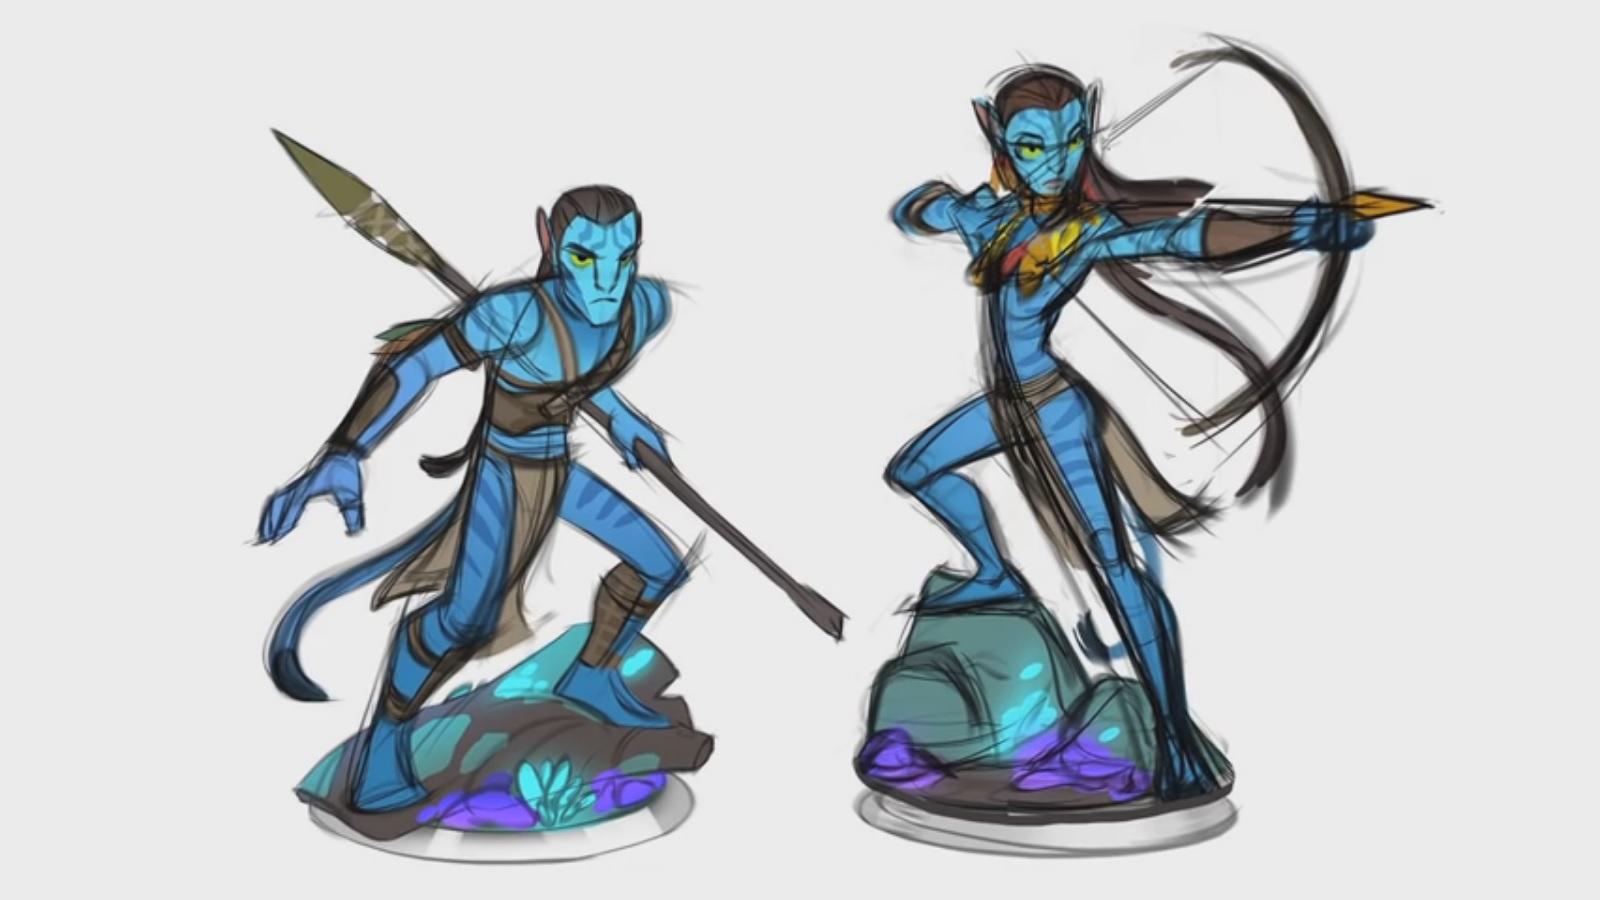 More Scrapped Disney Infinity 30 Figures Peter Pan